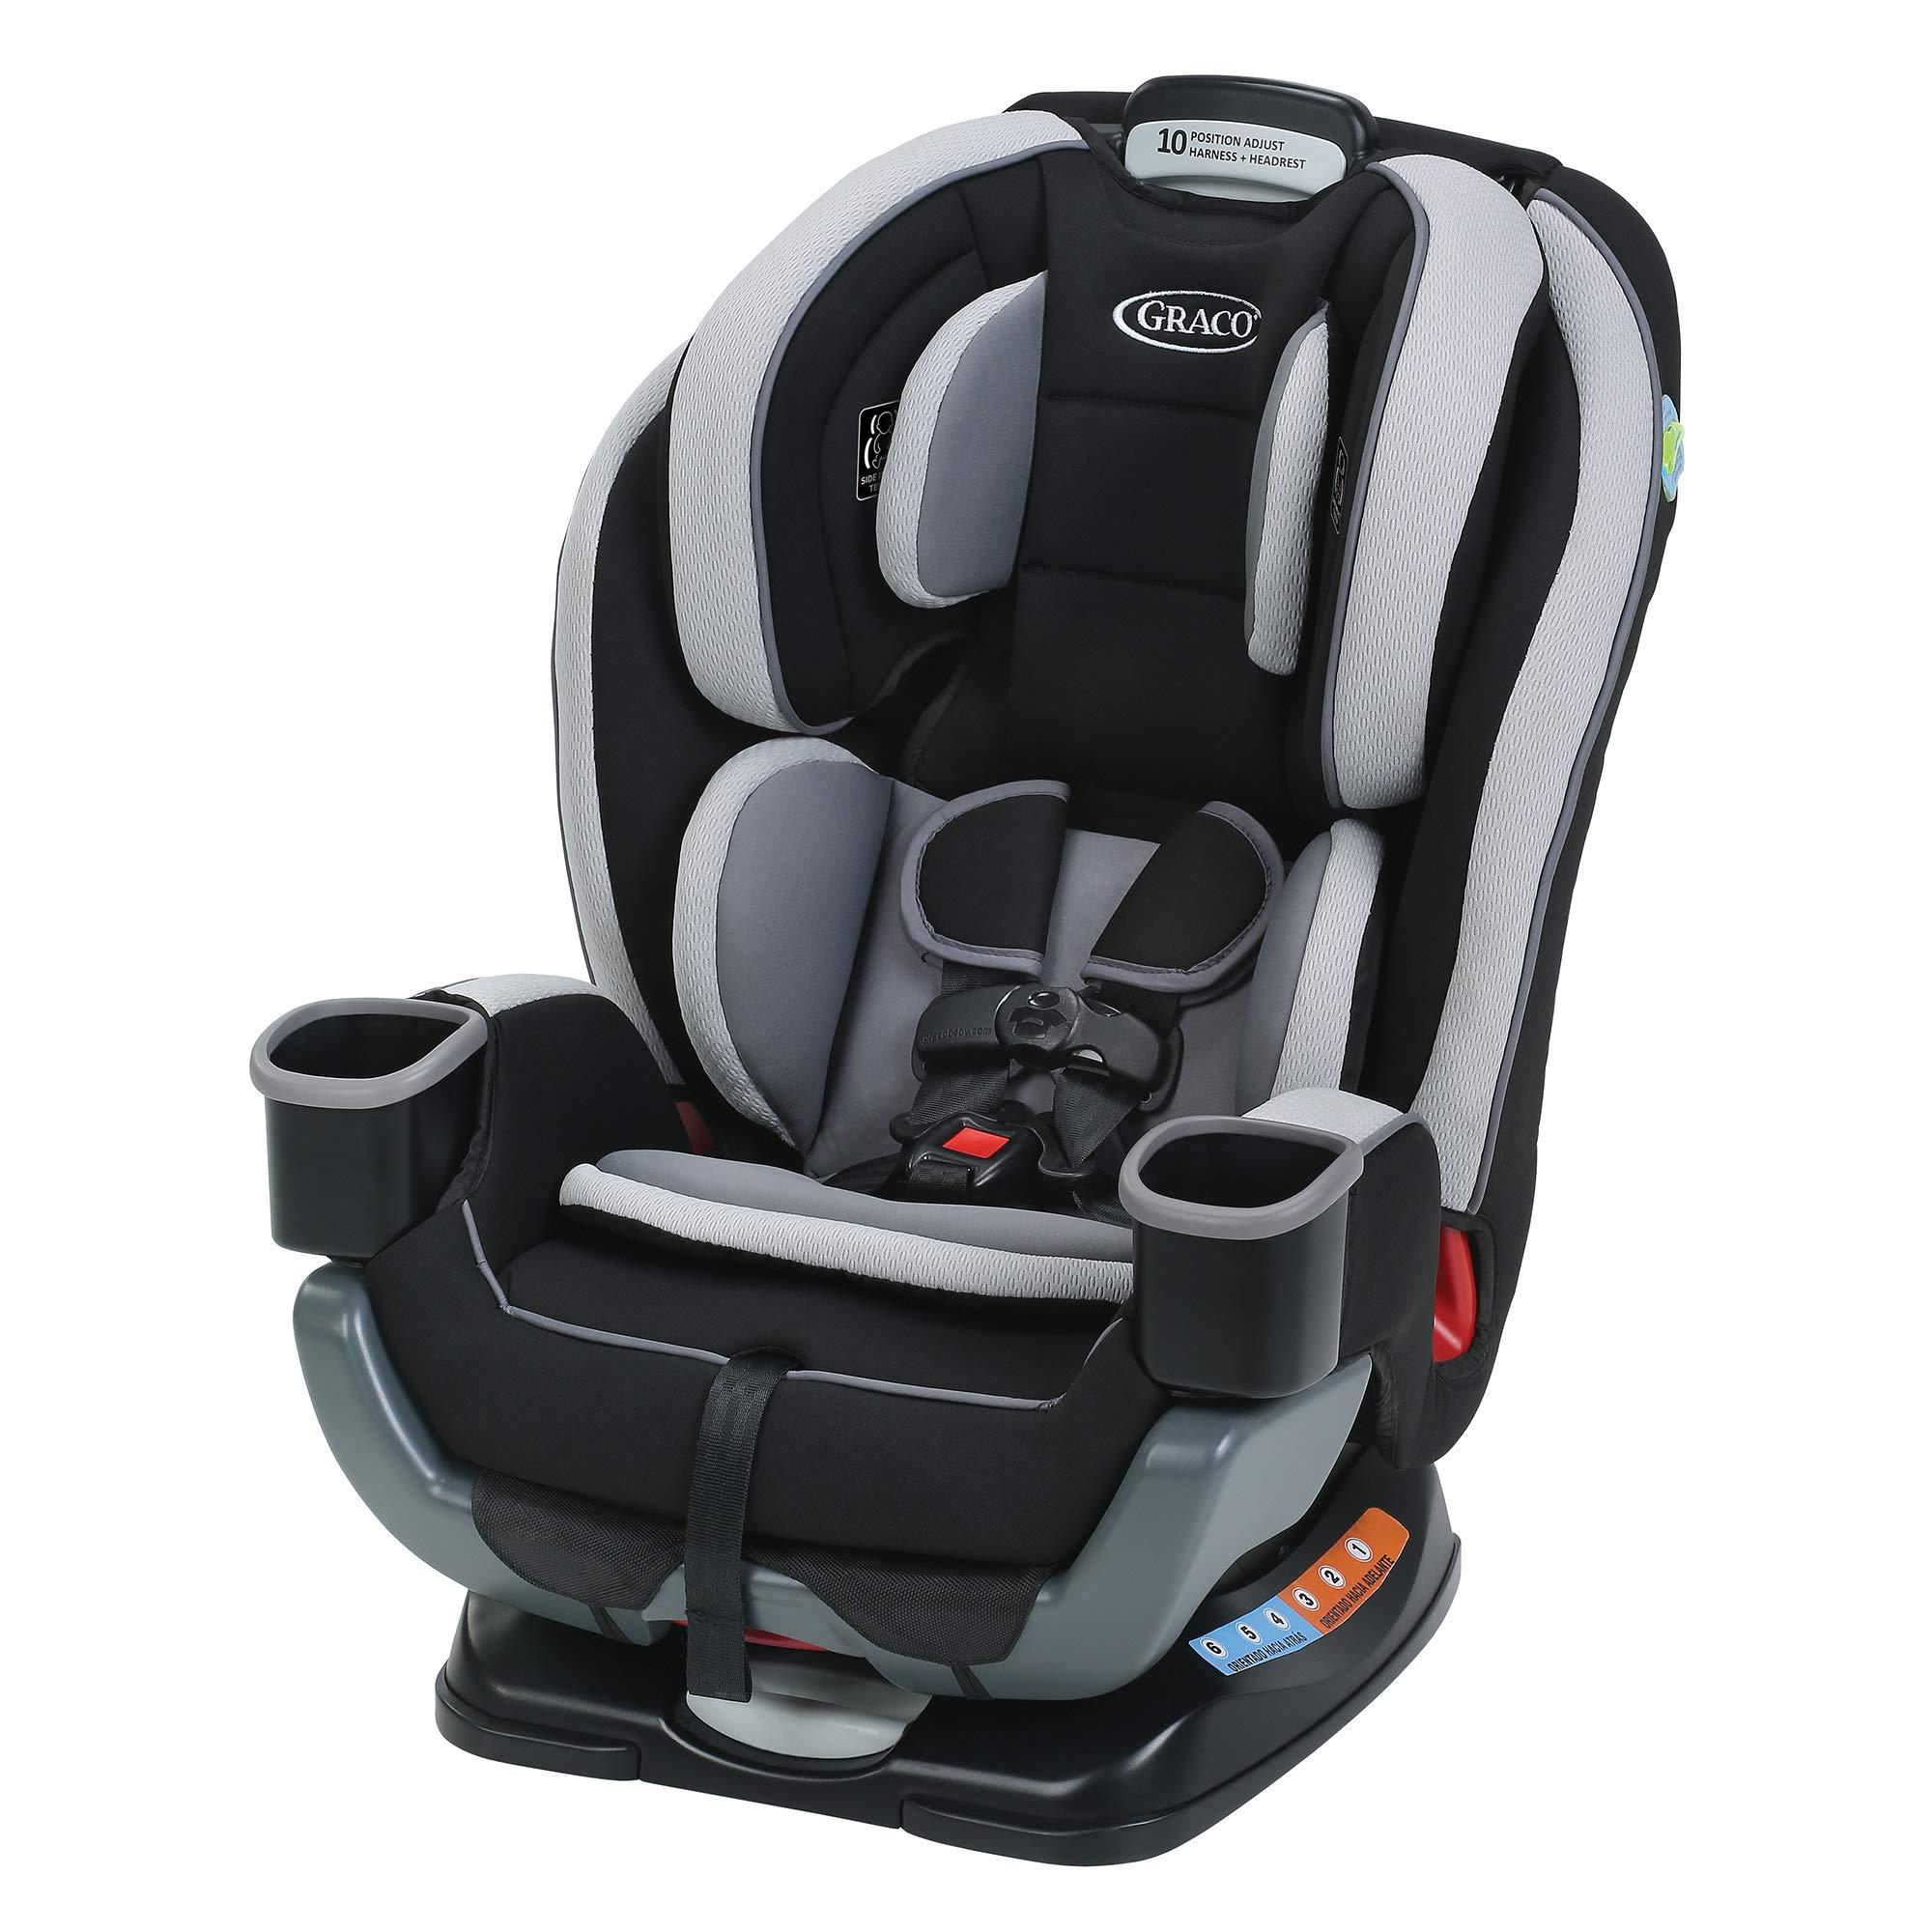 Graco Extend2Fit 3-in-1 Car Seat, Garner